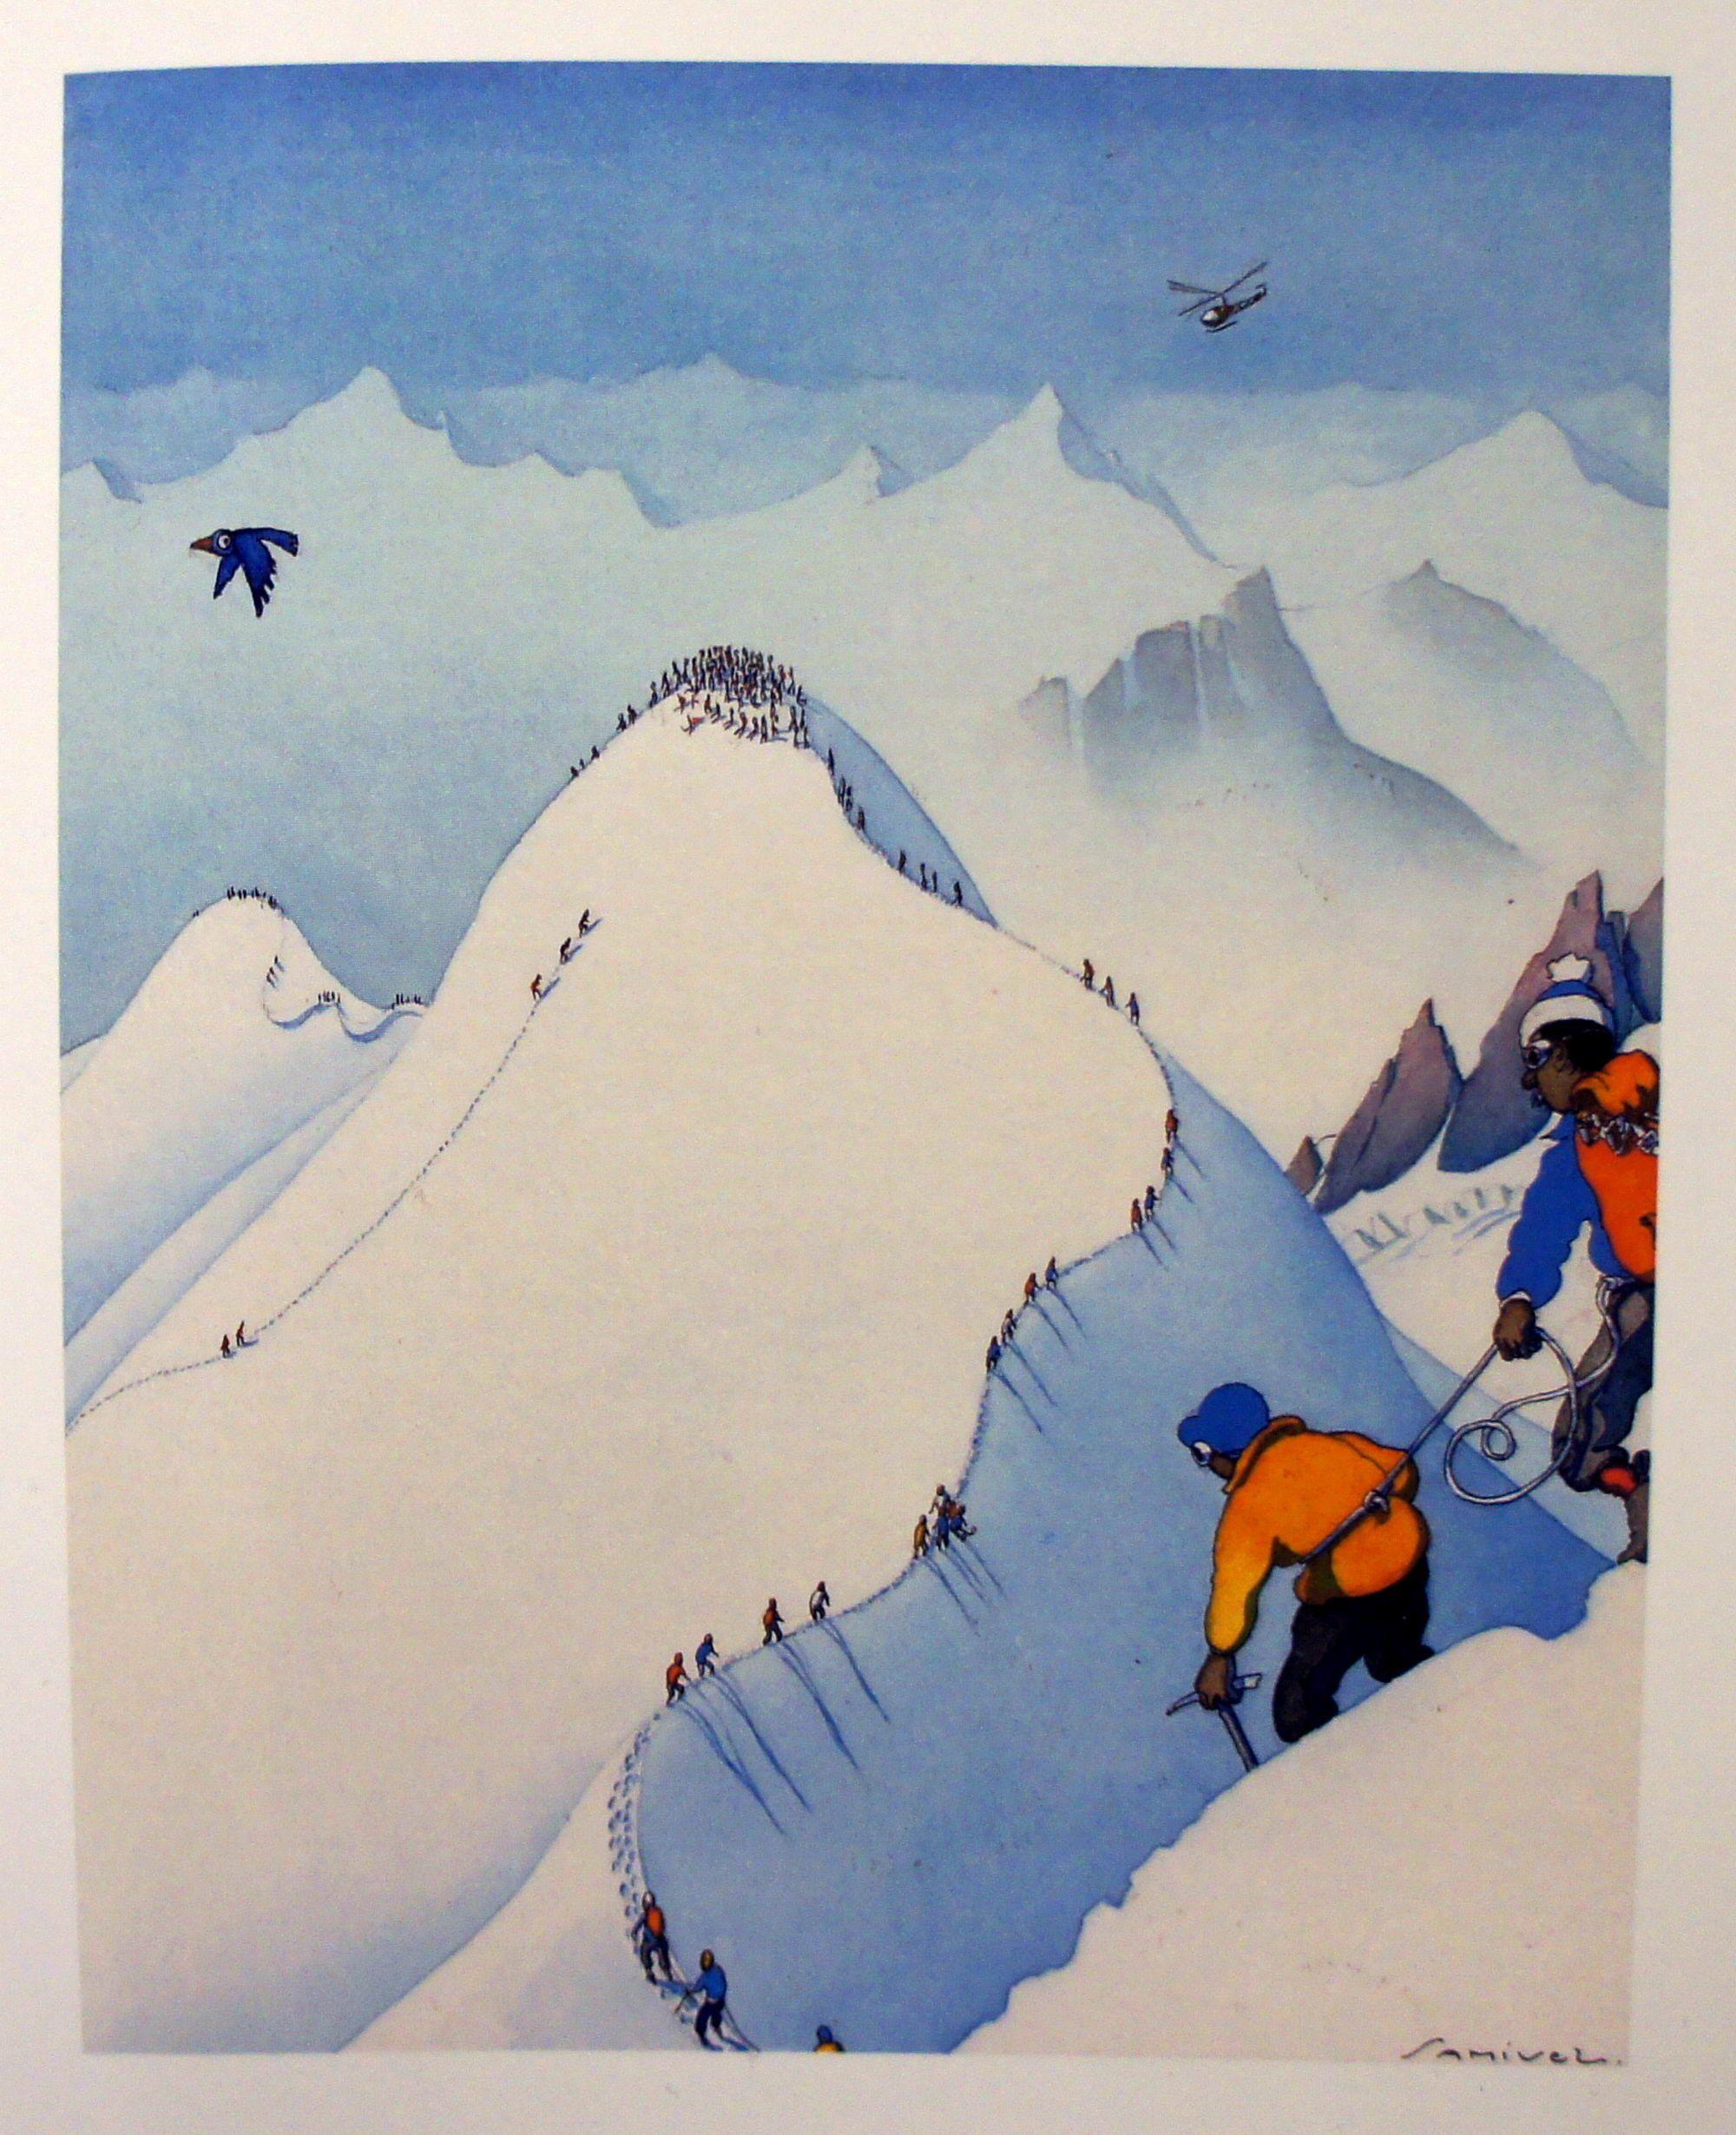 Samivel Un Artiste Des Montagnes Dessin Ski Carte Neige